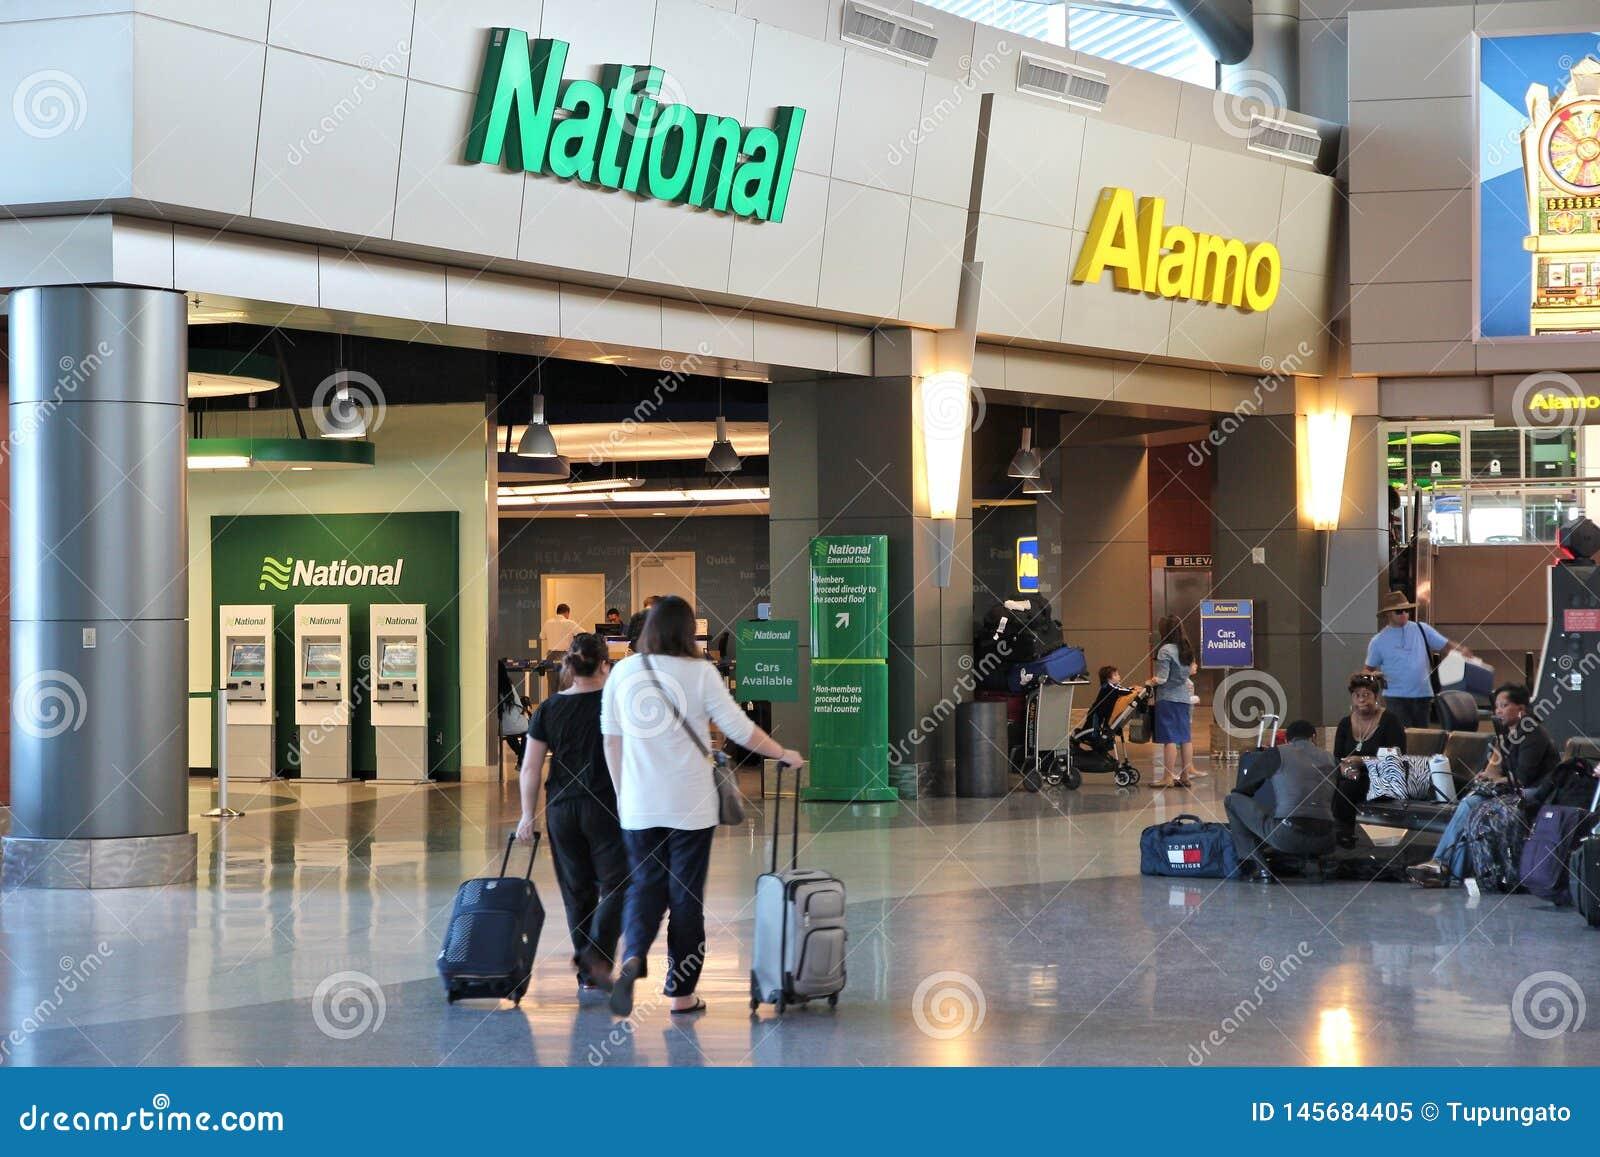 Airport Car Rental Editorial Image Image Of Corporation 145684405